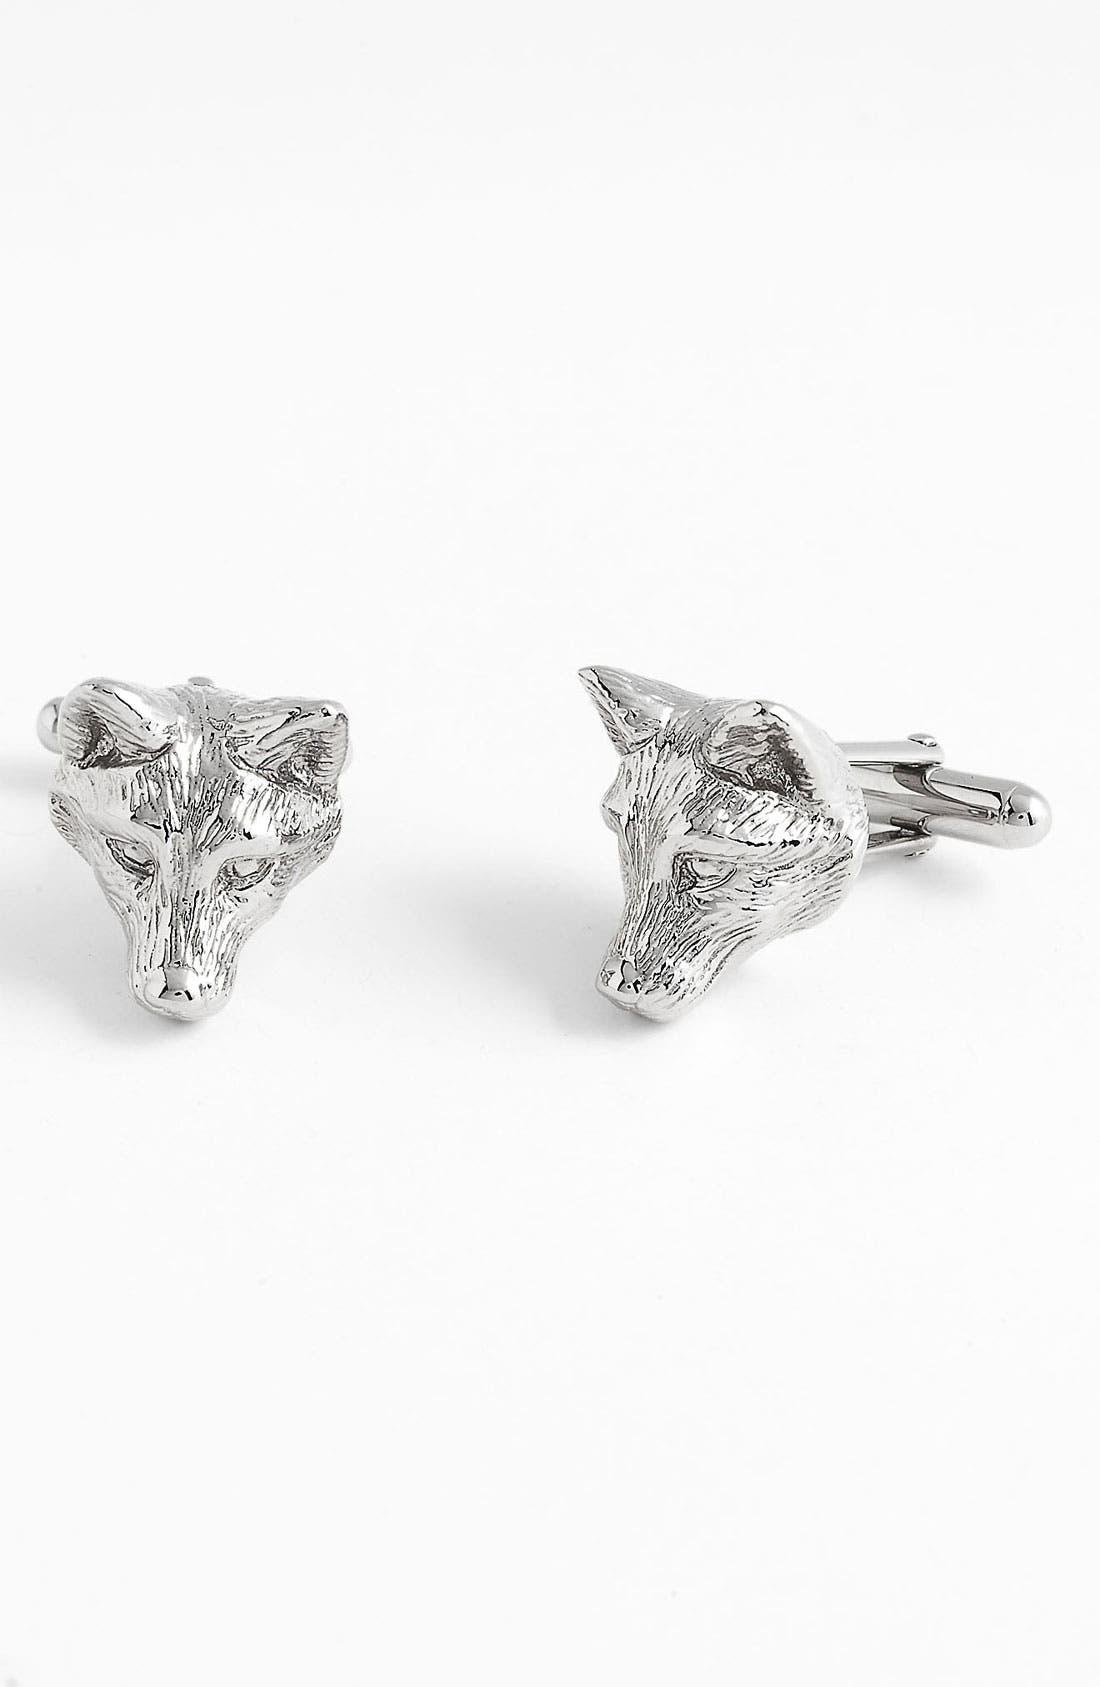 Main Image - Burberry 'Fox' Cuff Links